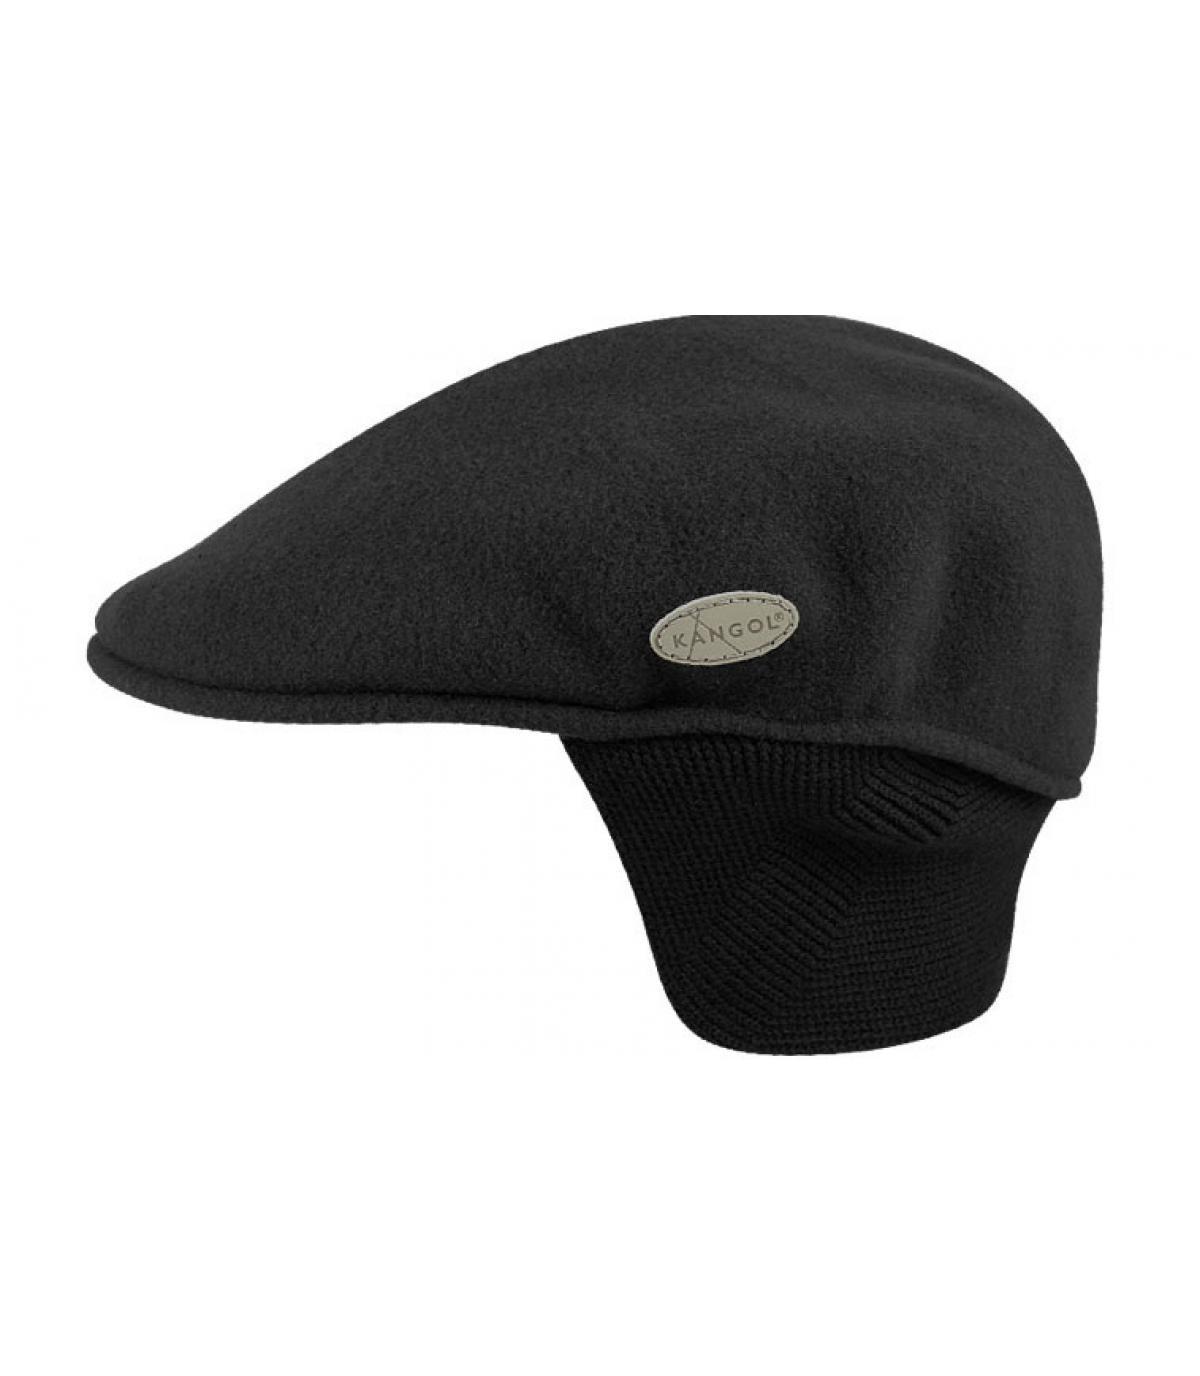 Details 504 wool earflap zwart - afbeeling 3